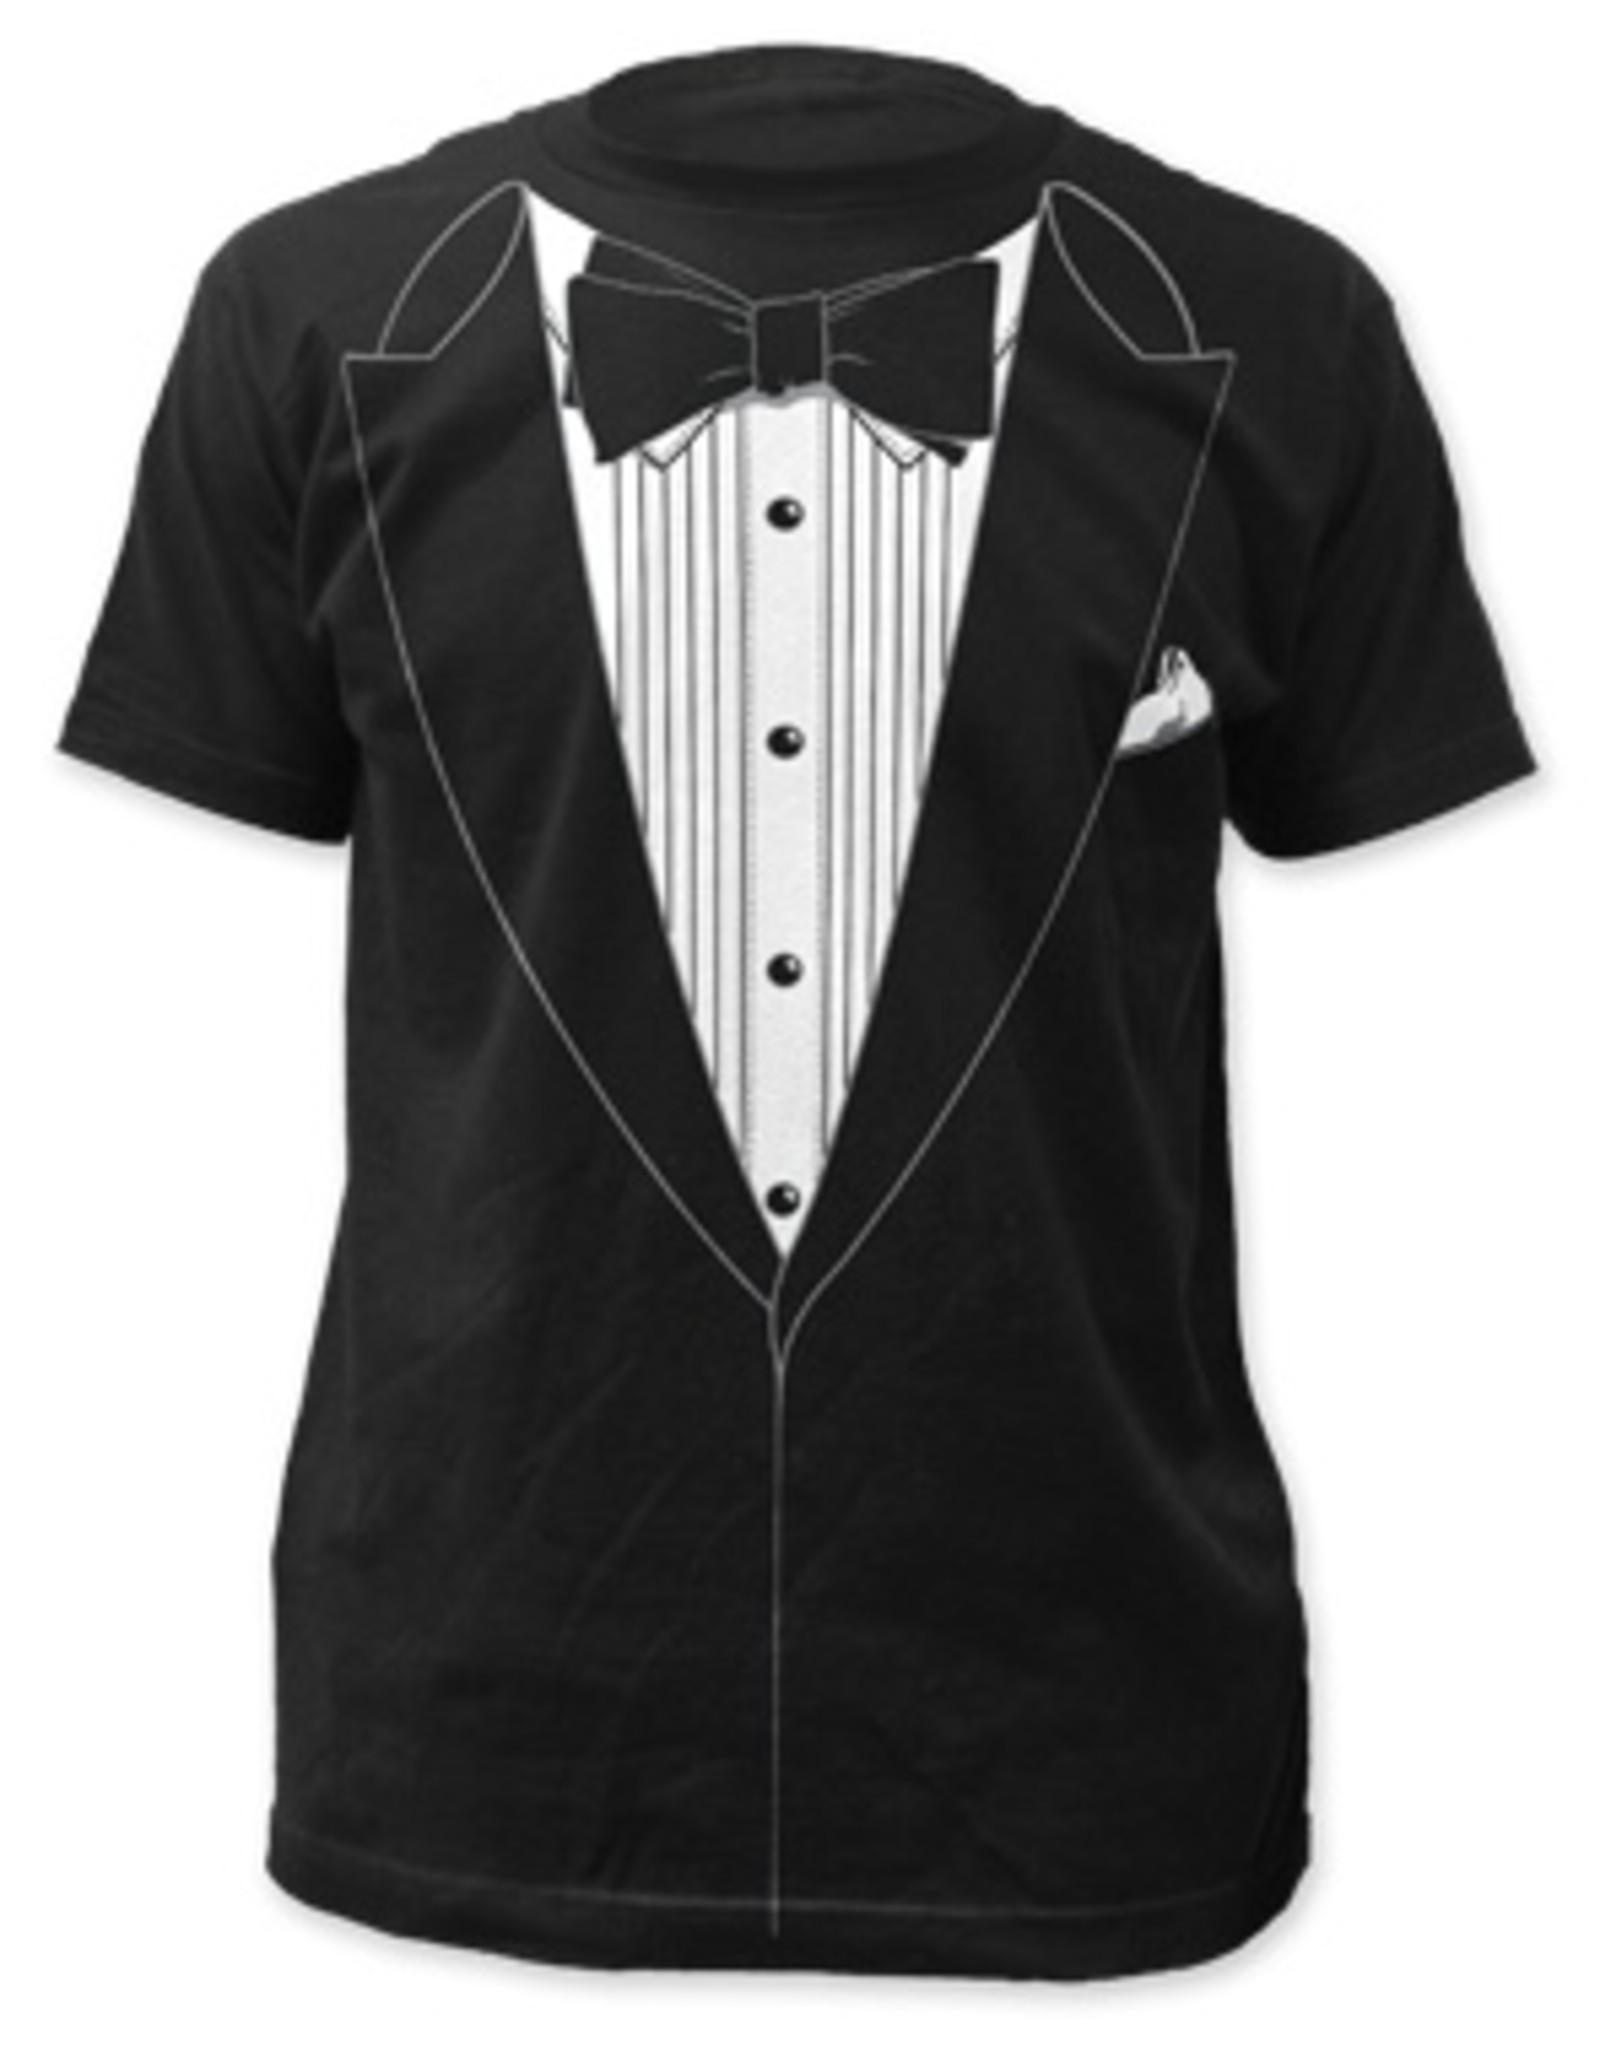 Impact Merchandising Tuxedo Tee